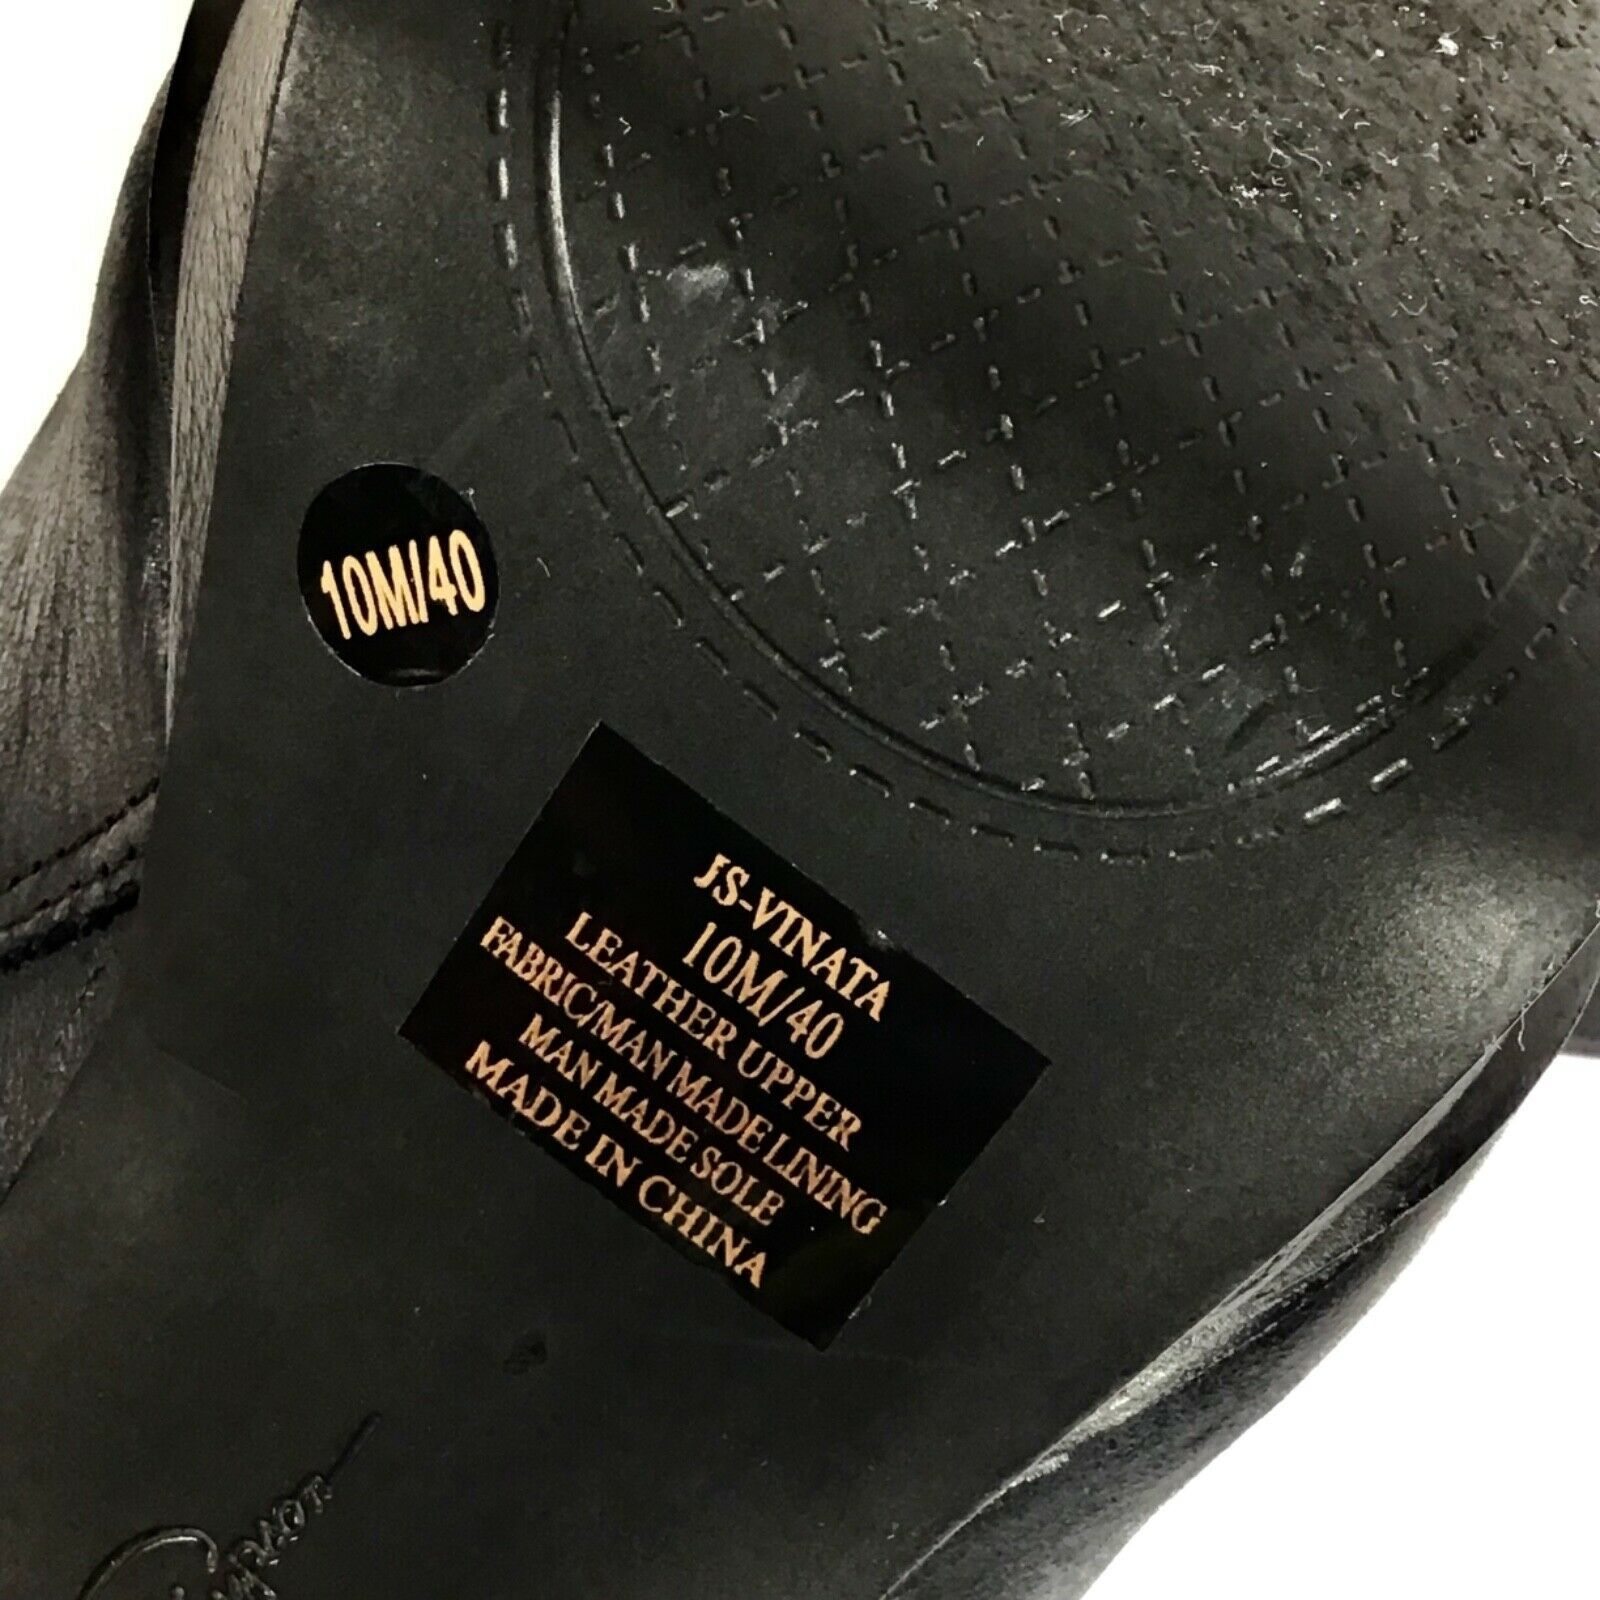 Jessica Simpson Vinata 10M Ankle Bootie Platform Stiletto Heels Chains Side Zip  image 8